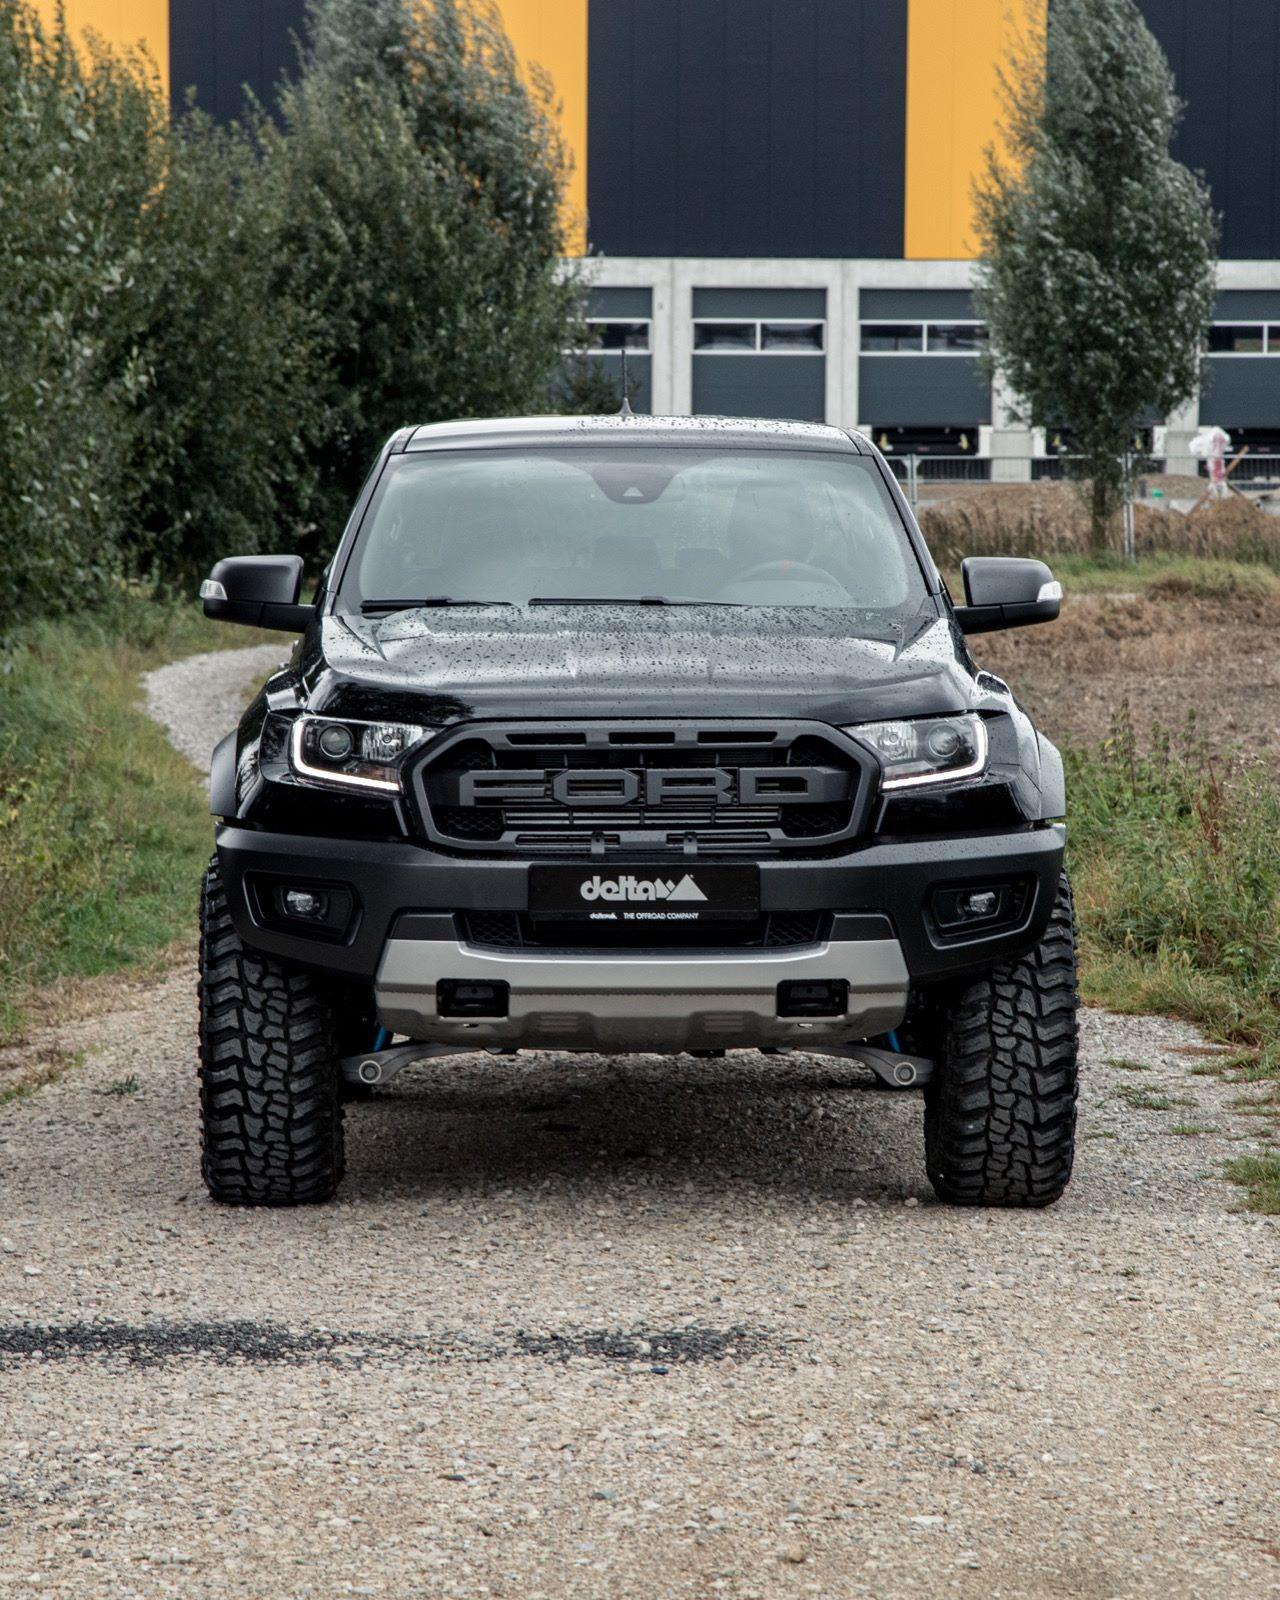 Ford-Ranger-Raptor-by-Delta-4x4-10